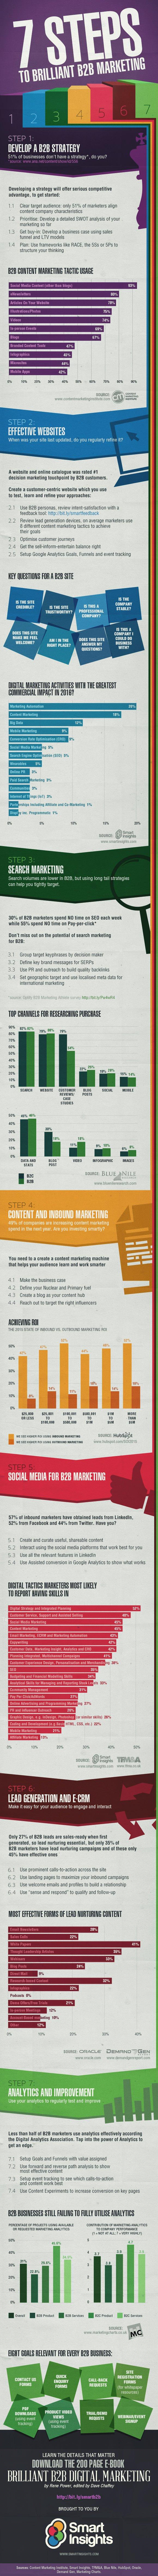 Infographic – 7 Steps to Brilliant B2B Marketing